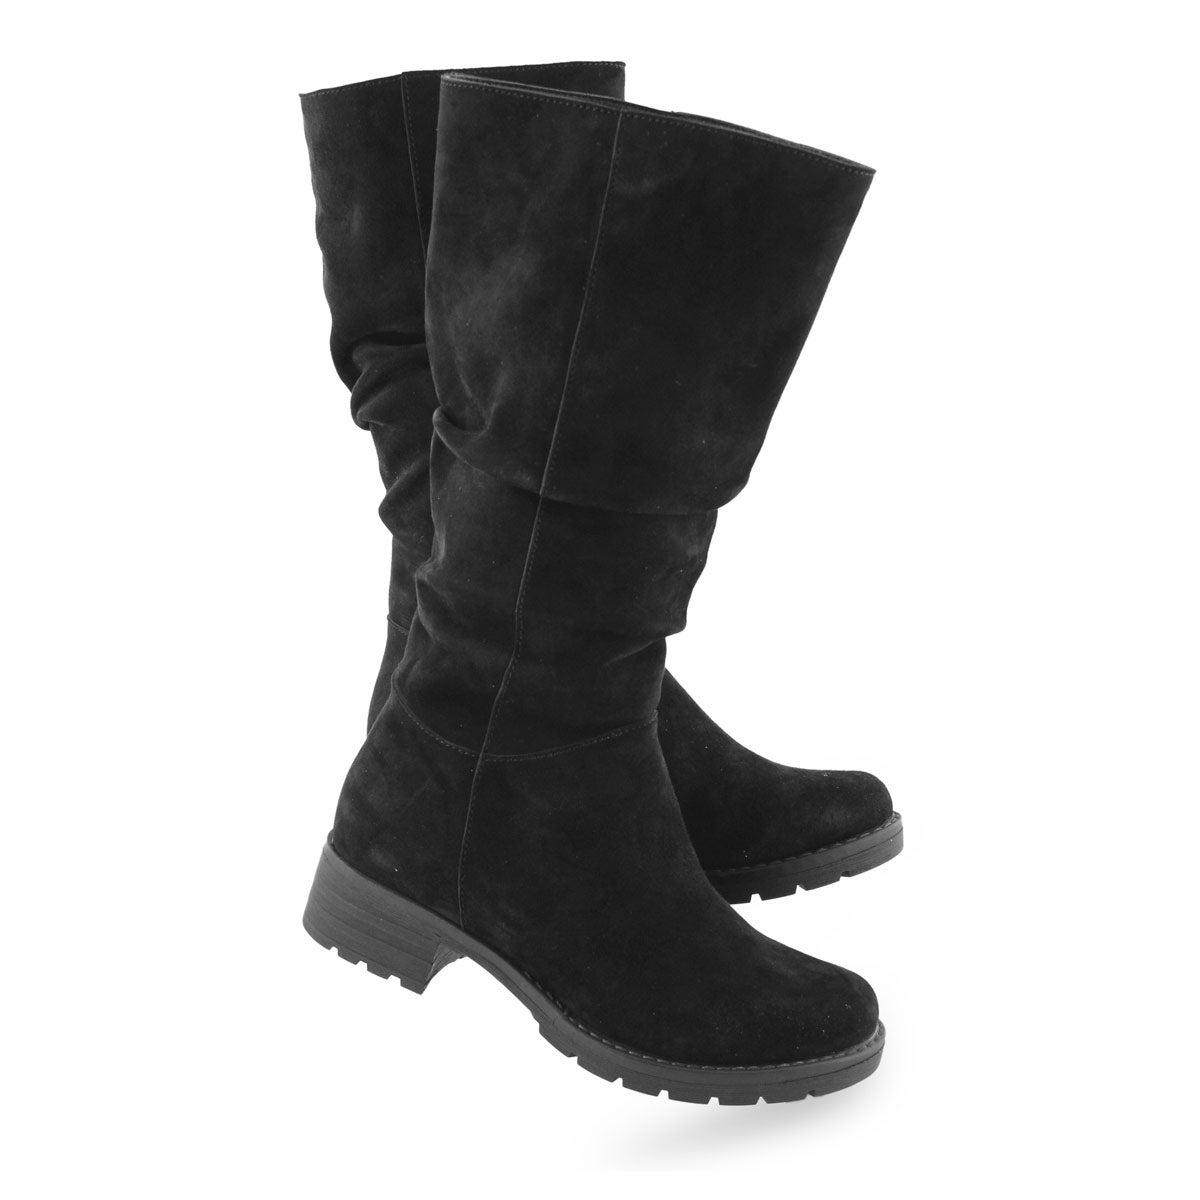 Women's DELORES black casual mid calf boot